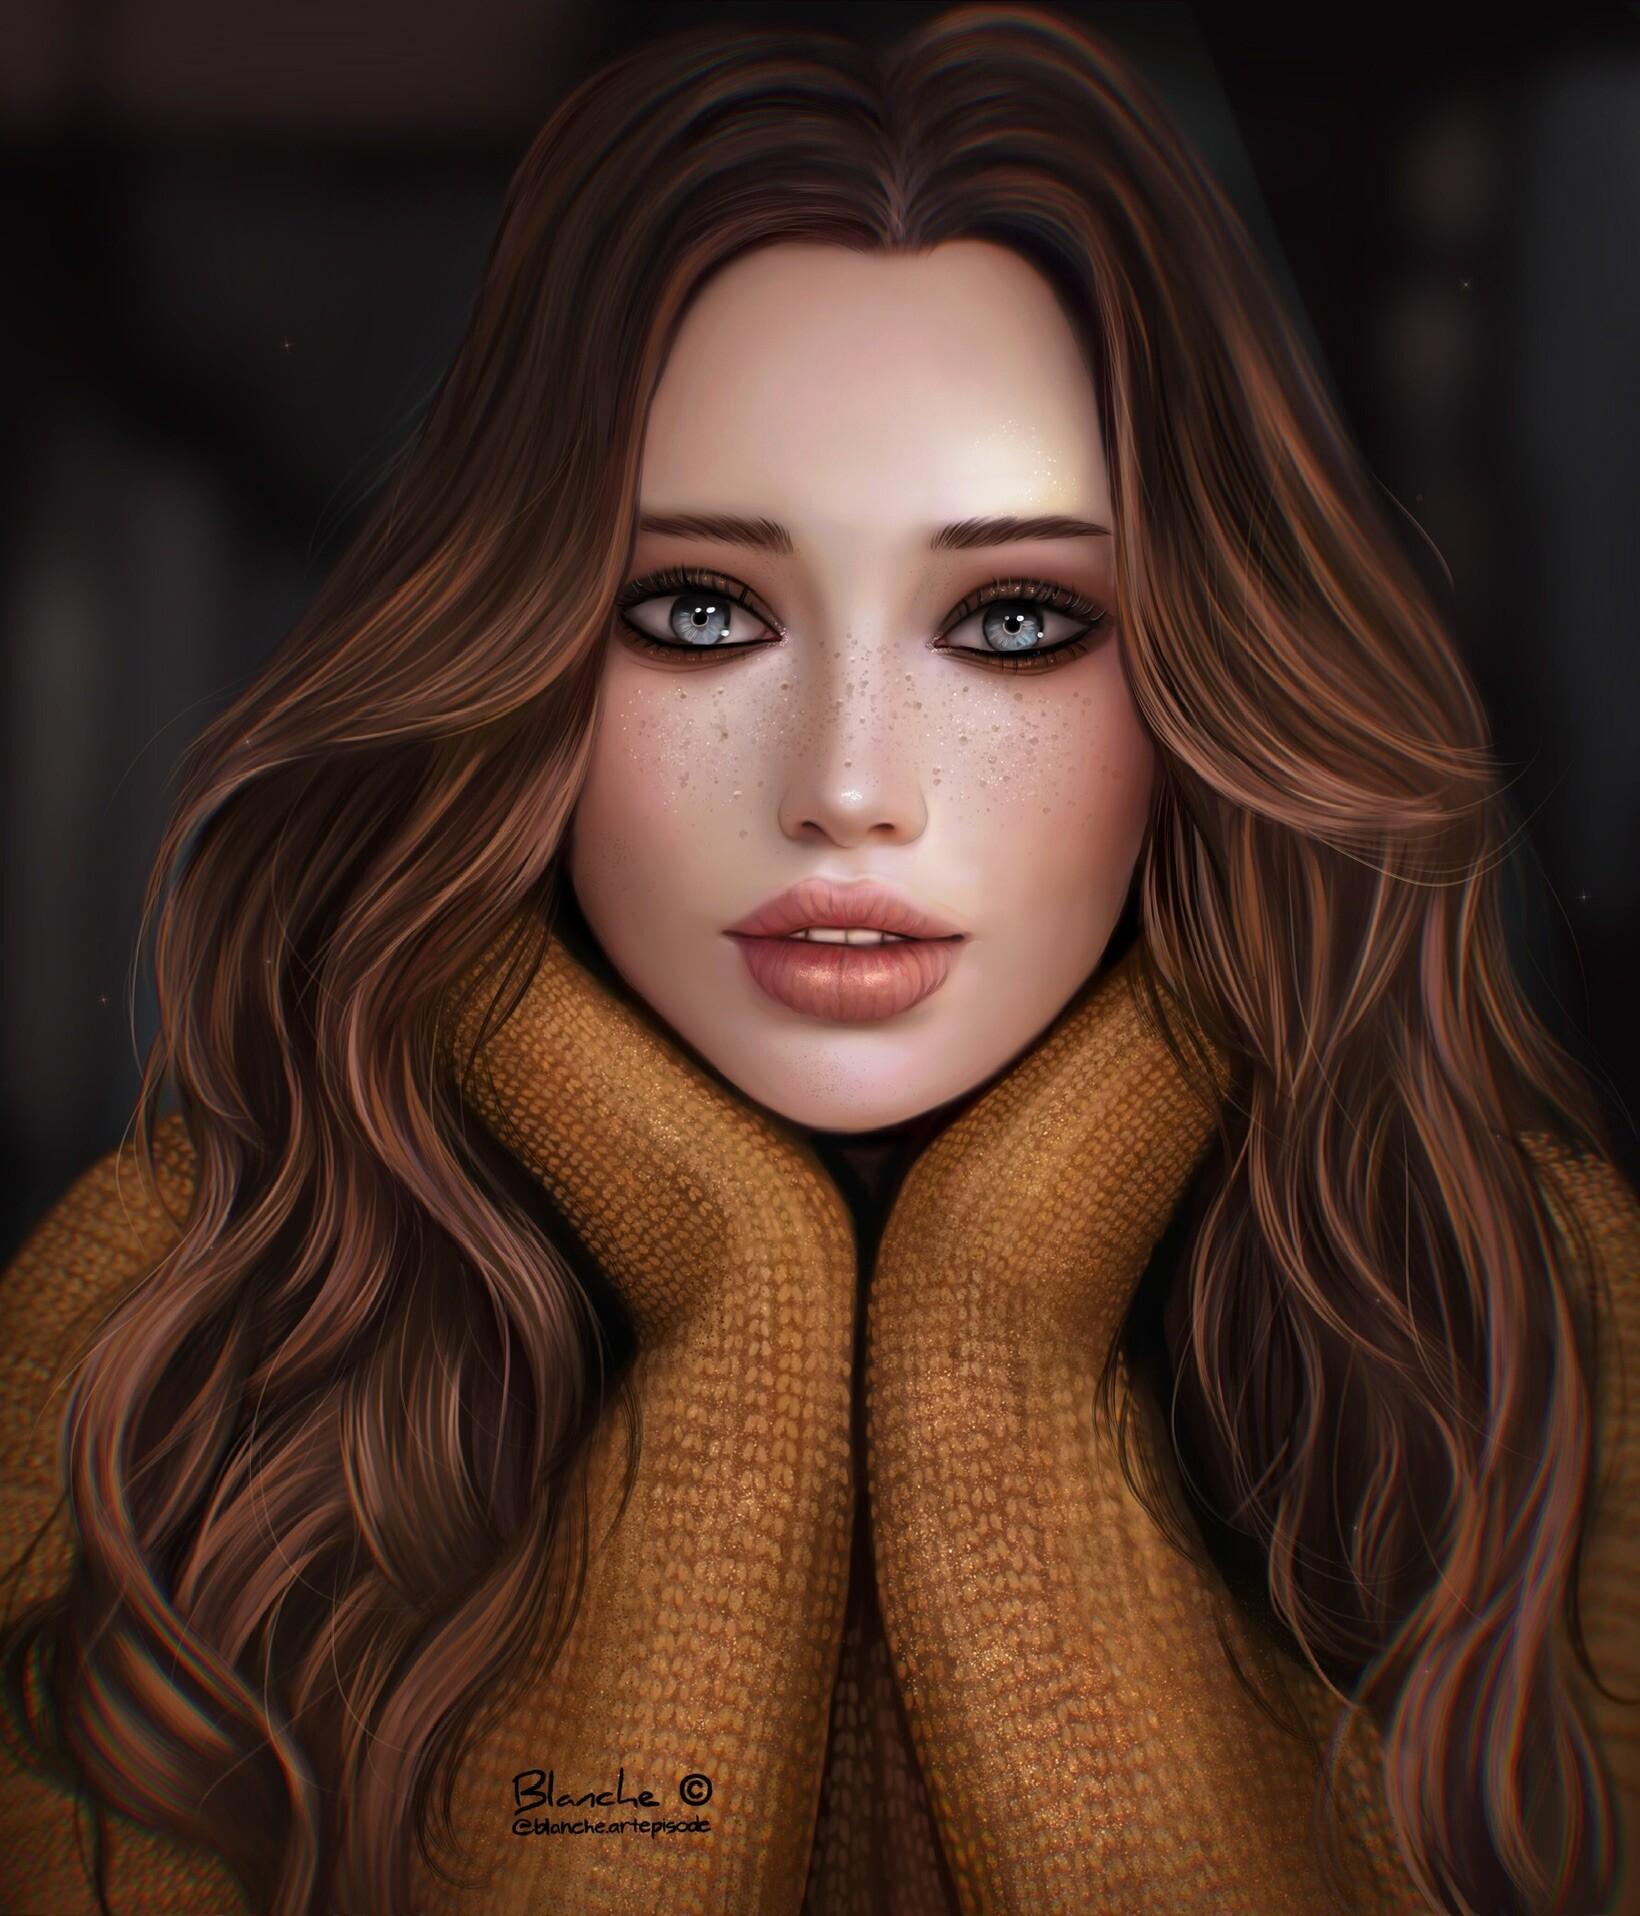 blanche art - girl digital